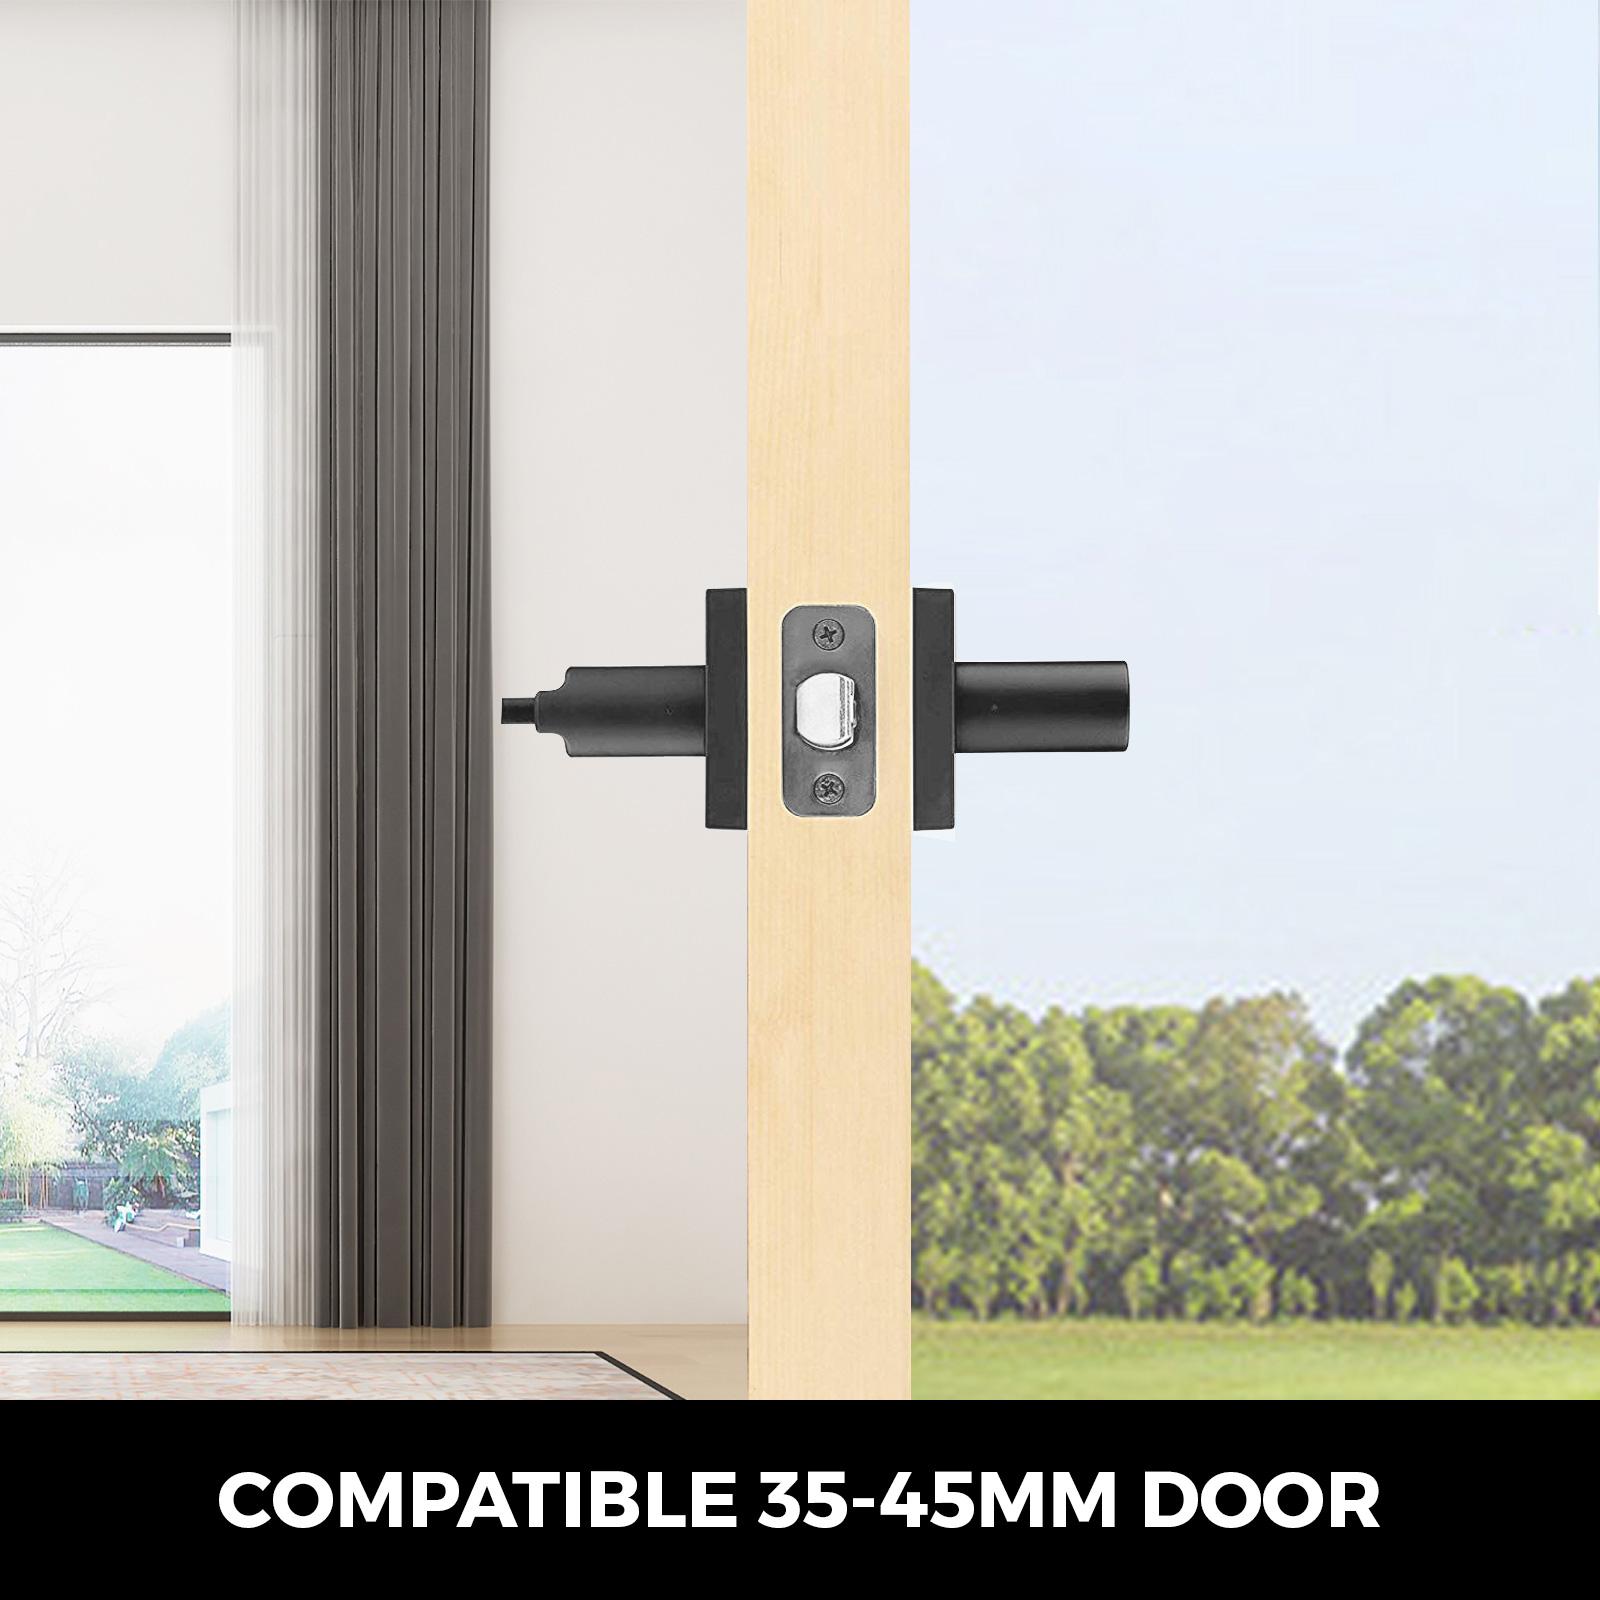 Door-Handles-Matte-Black-Door-Lever-3-5-10-Pack-Passage-Privace-Entry-Lock-Set thumbnail 77